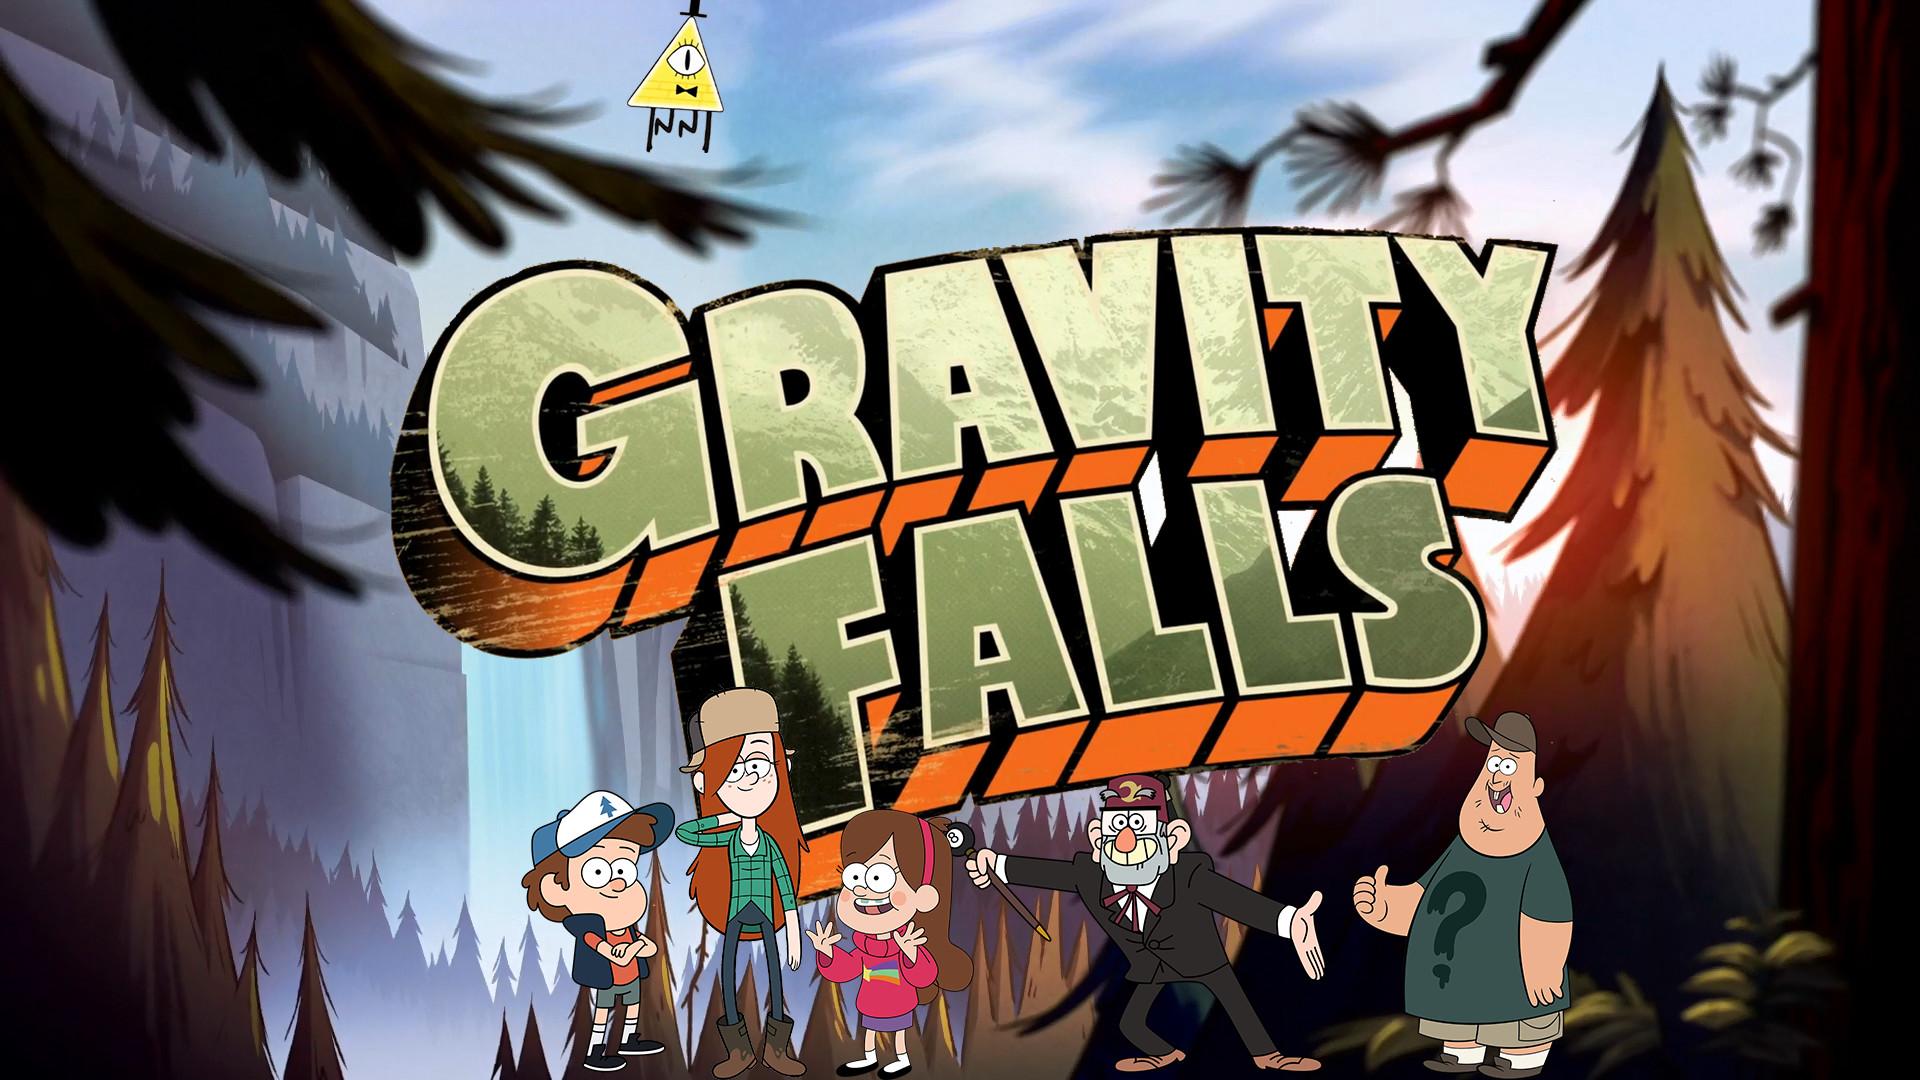 Gravity Falls Wallpaper by moechtegernkuenstler Gravity Falls Wallpaper by  moechtegernkuenstler